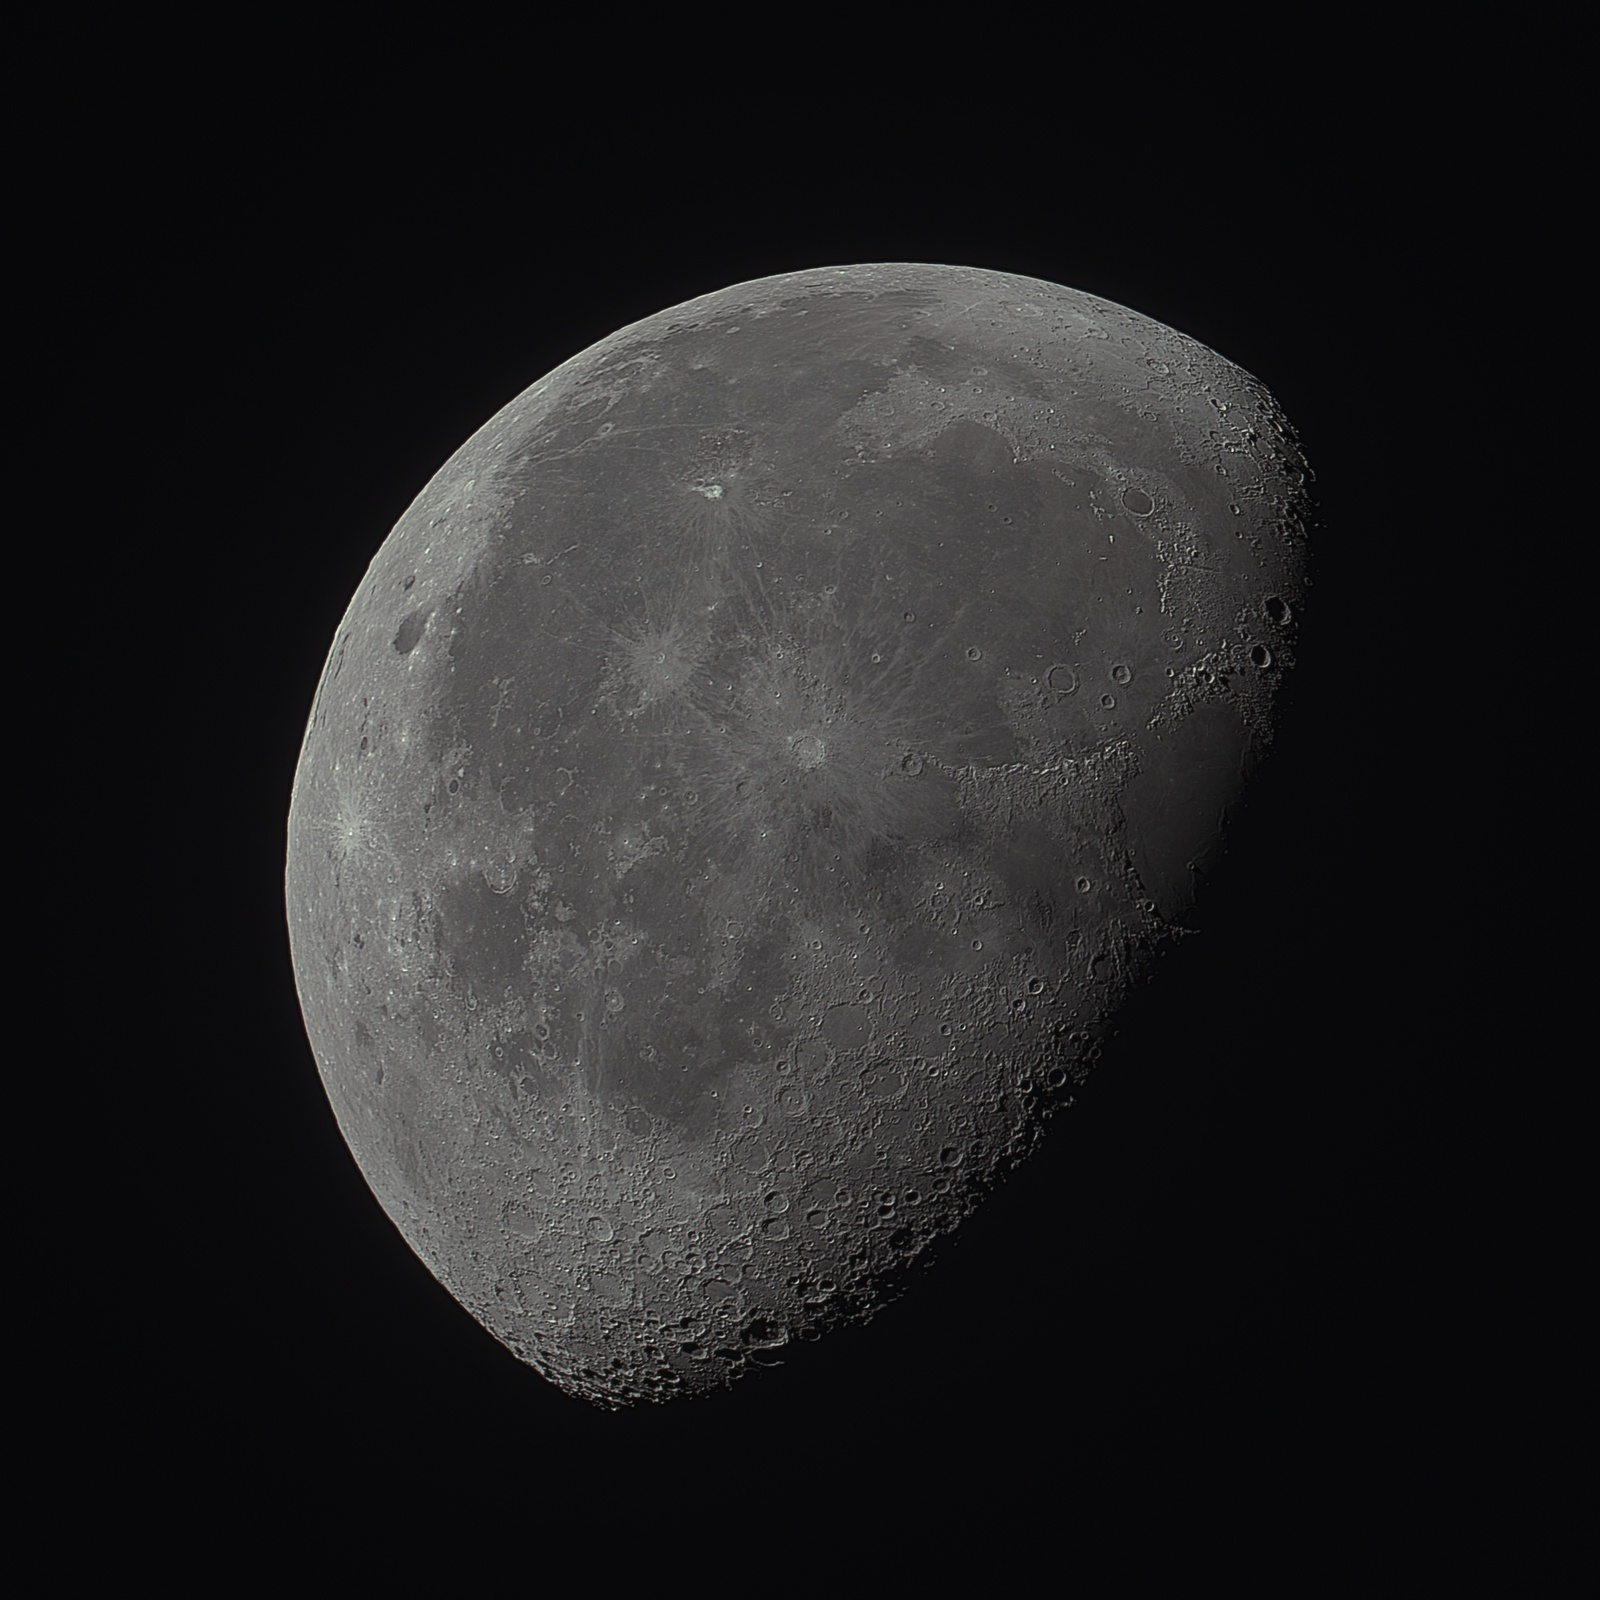 Moon_00_40_41_l4_ap472_conv_crop_2400_2400_resize_2000.thumb.jpg.406fe4ddd00290c670e0ad096b4e1225.jpg